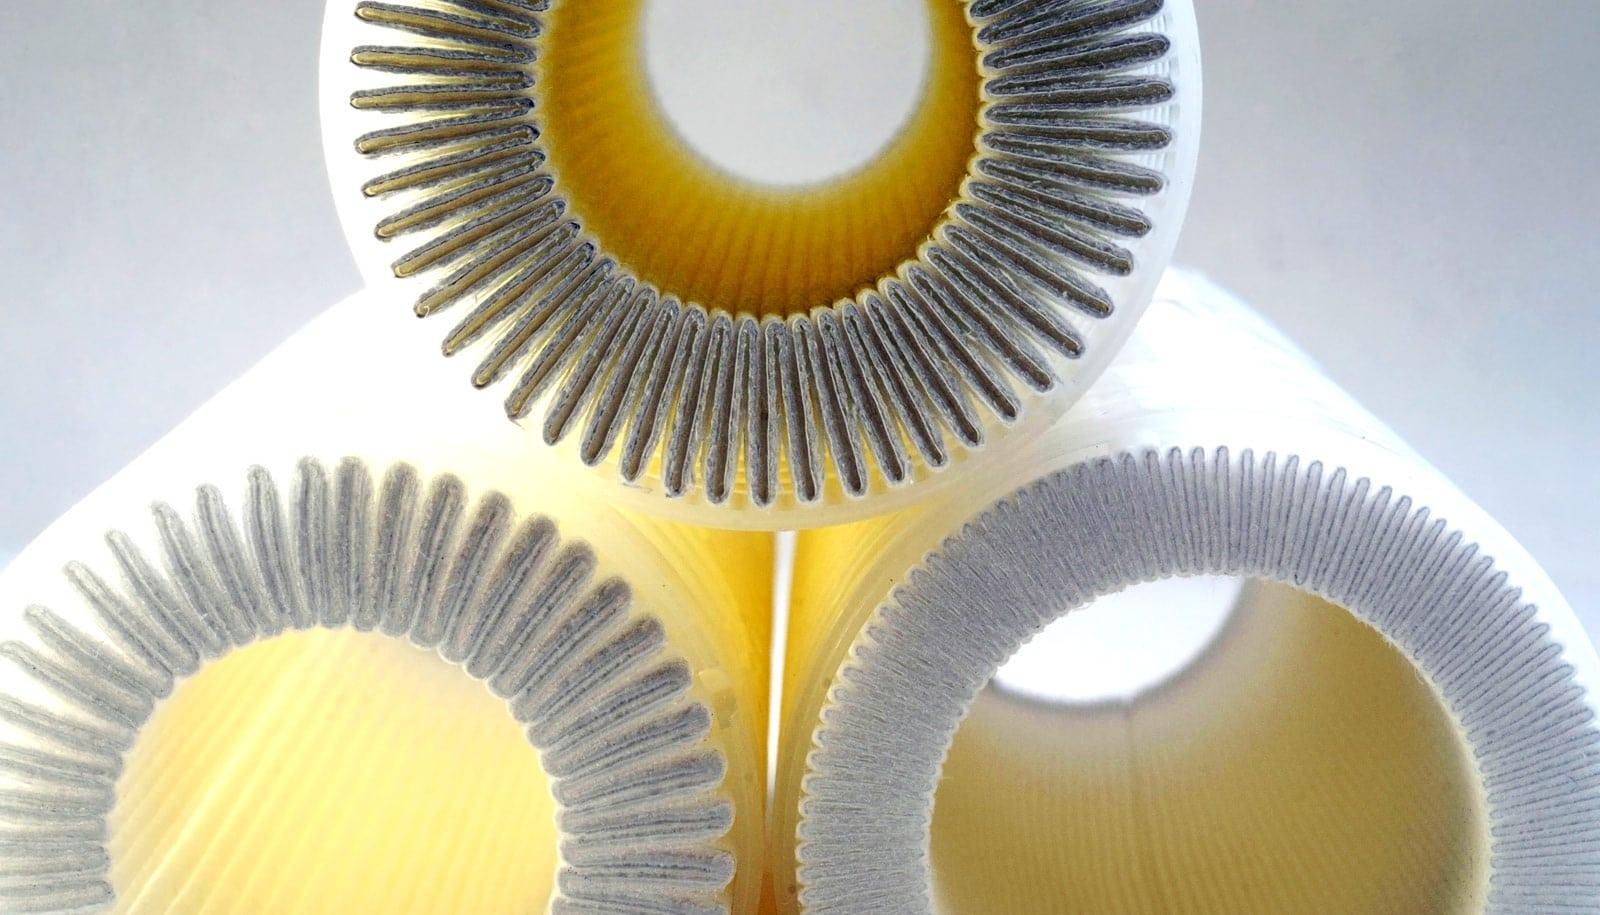 Reusable freeze-dried foam sucks up carbon dioxide - Futurity